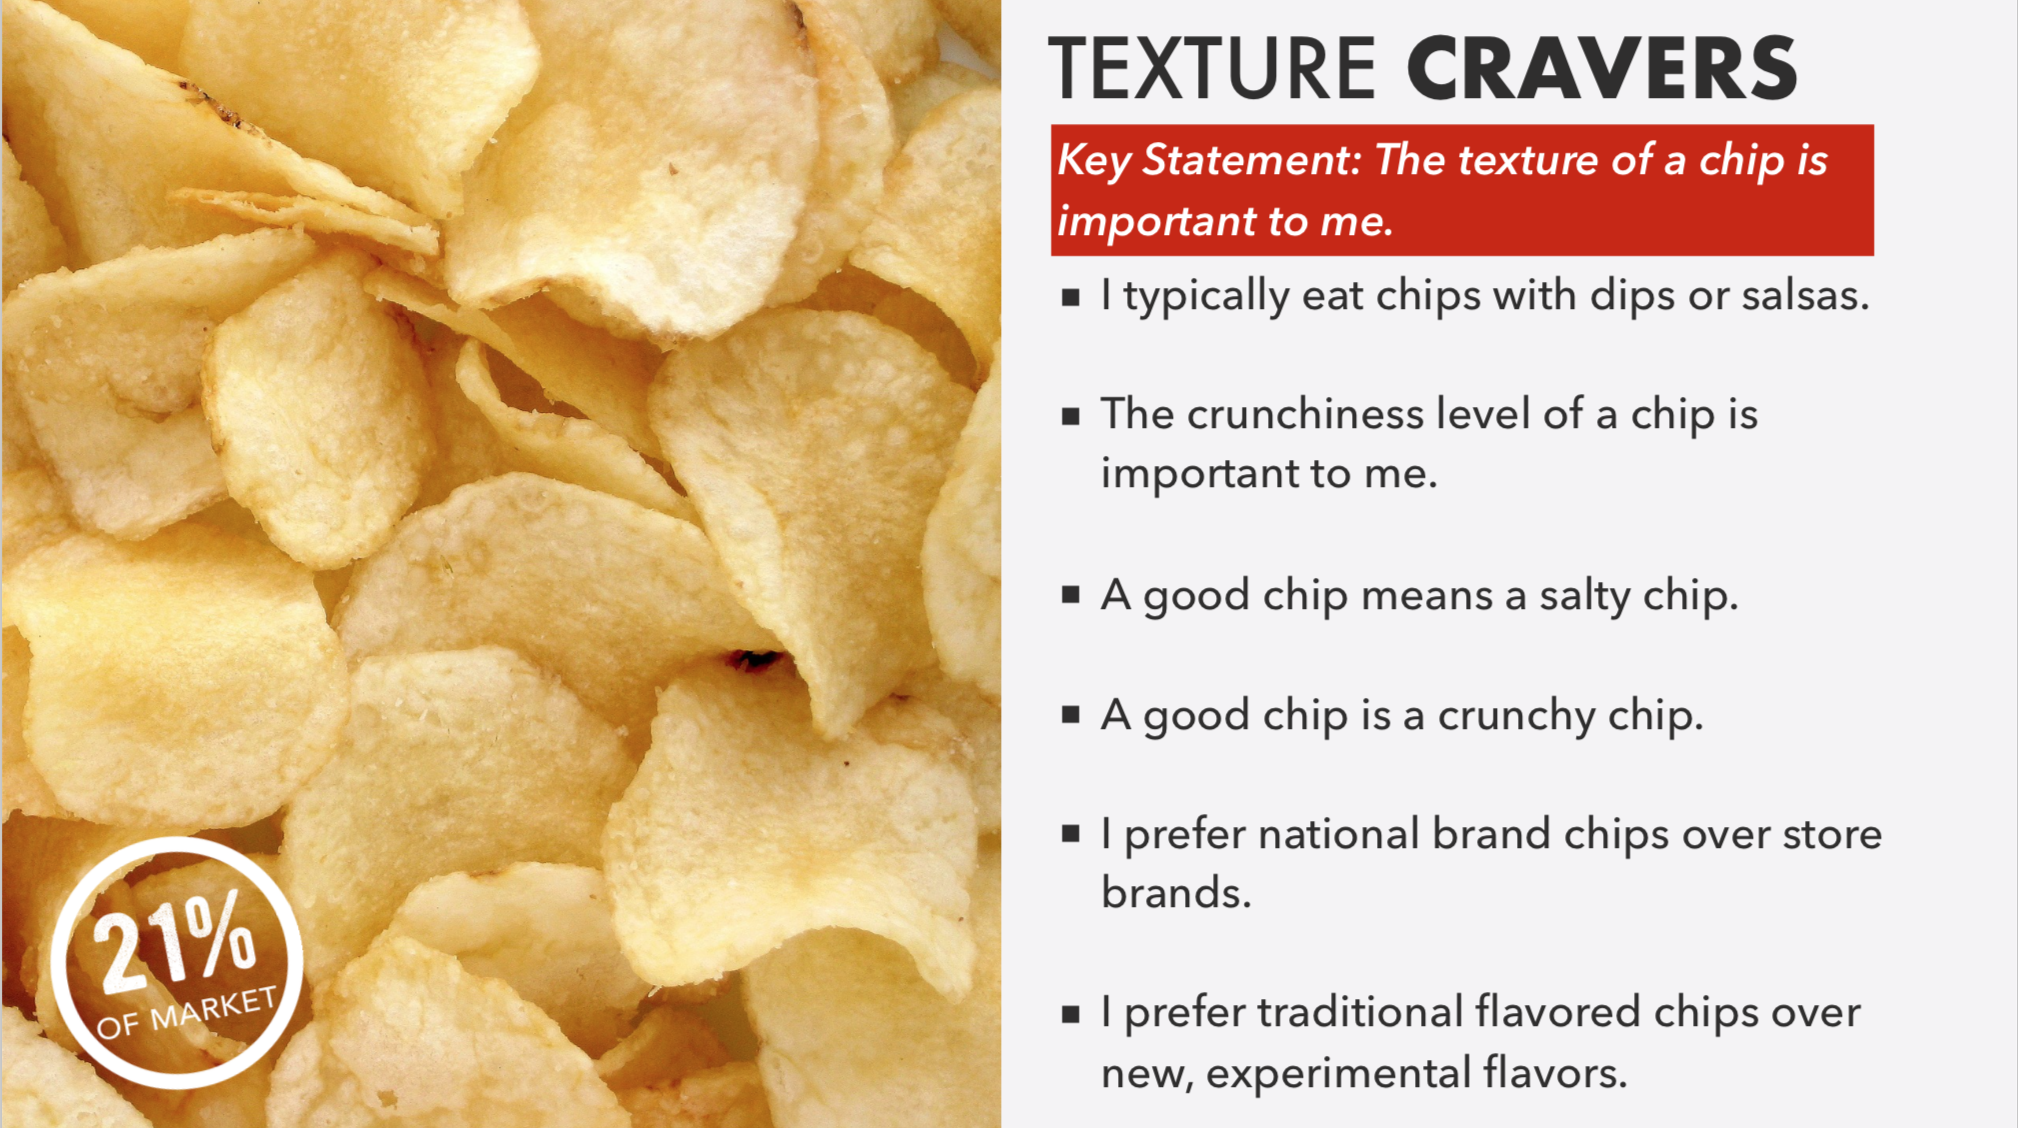 Texture Cravers